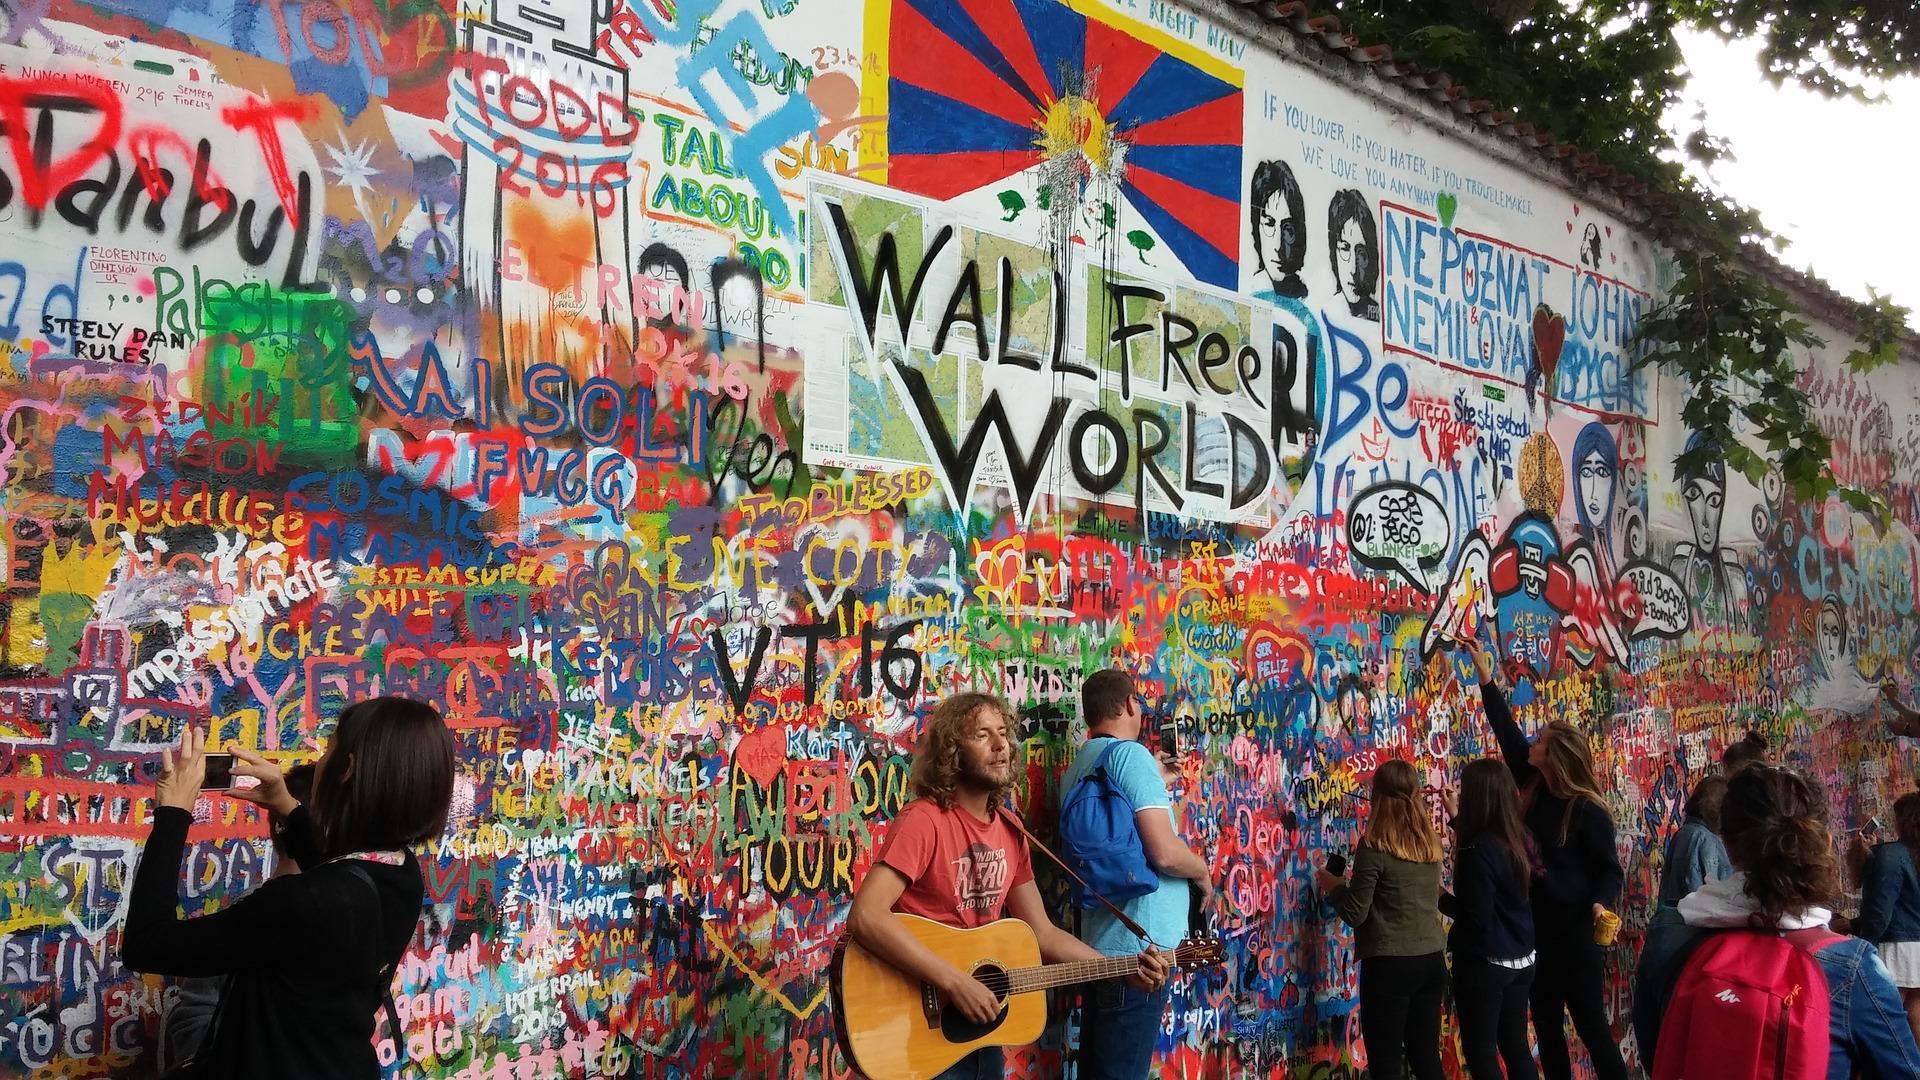 Counterculture, The Beatles Legacy